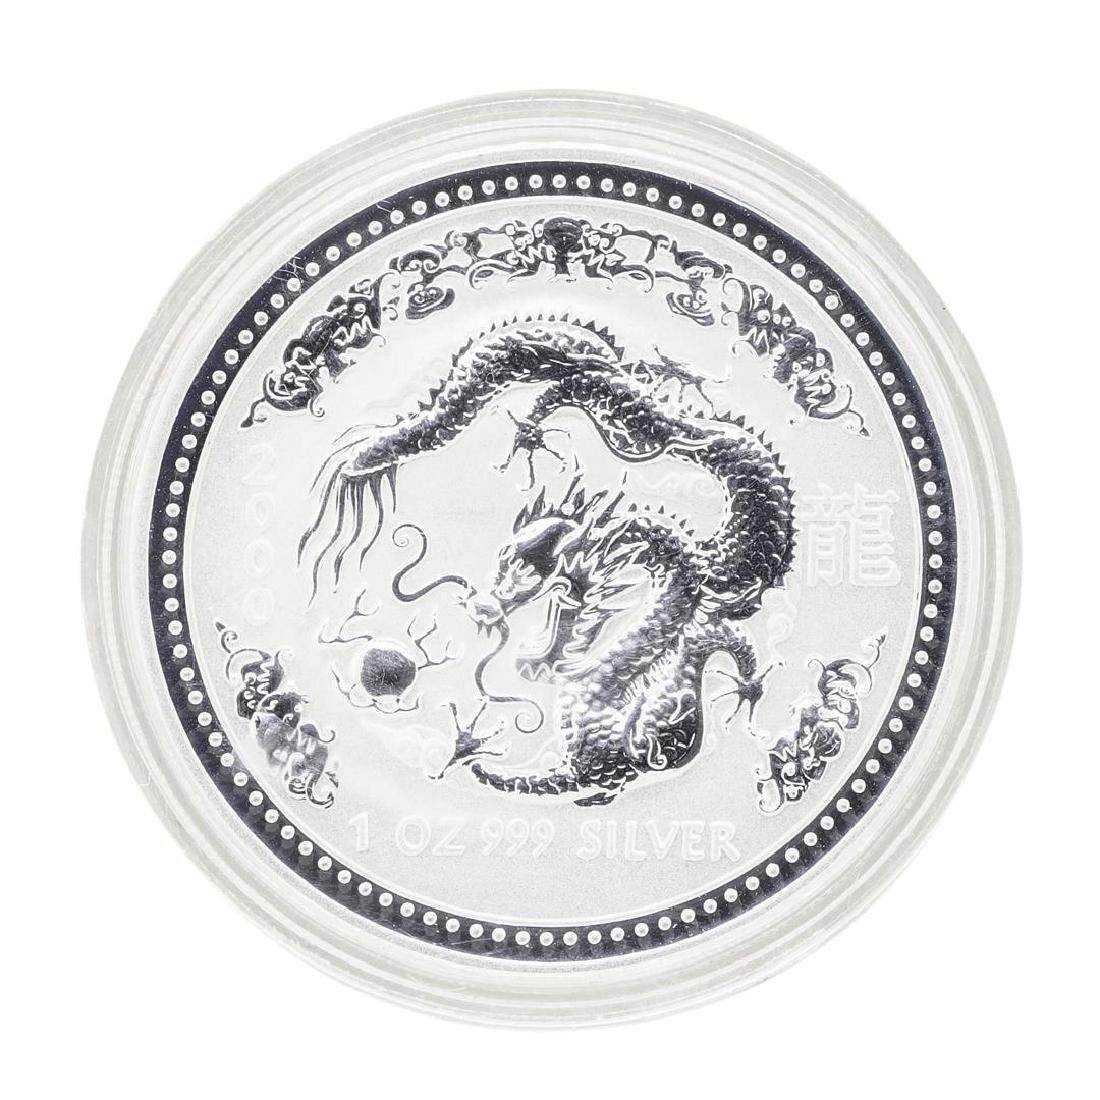 2000 Australia Silver Lunar Dragon Coin